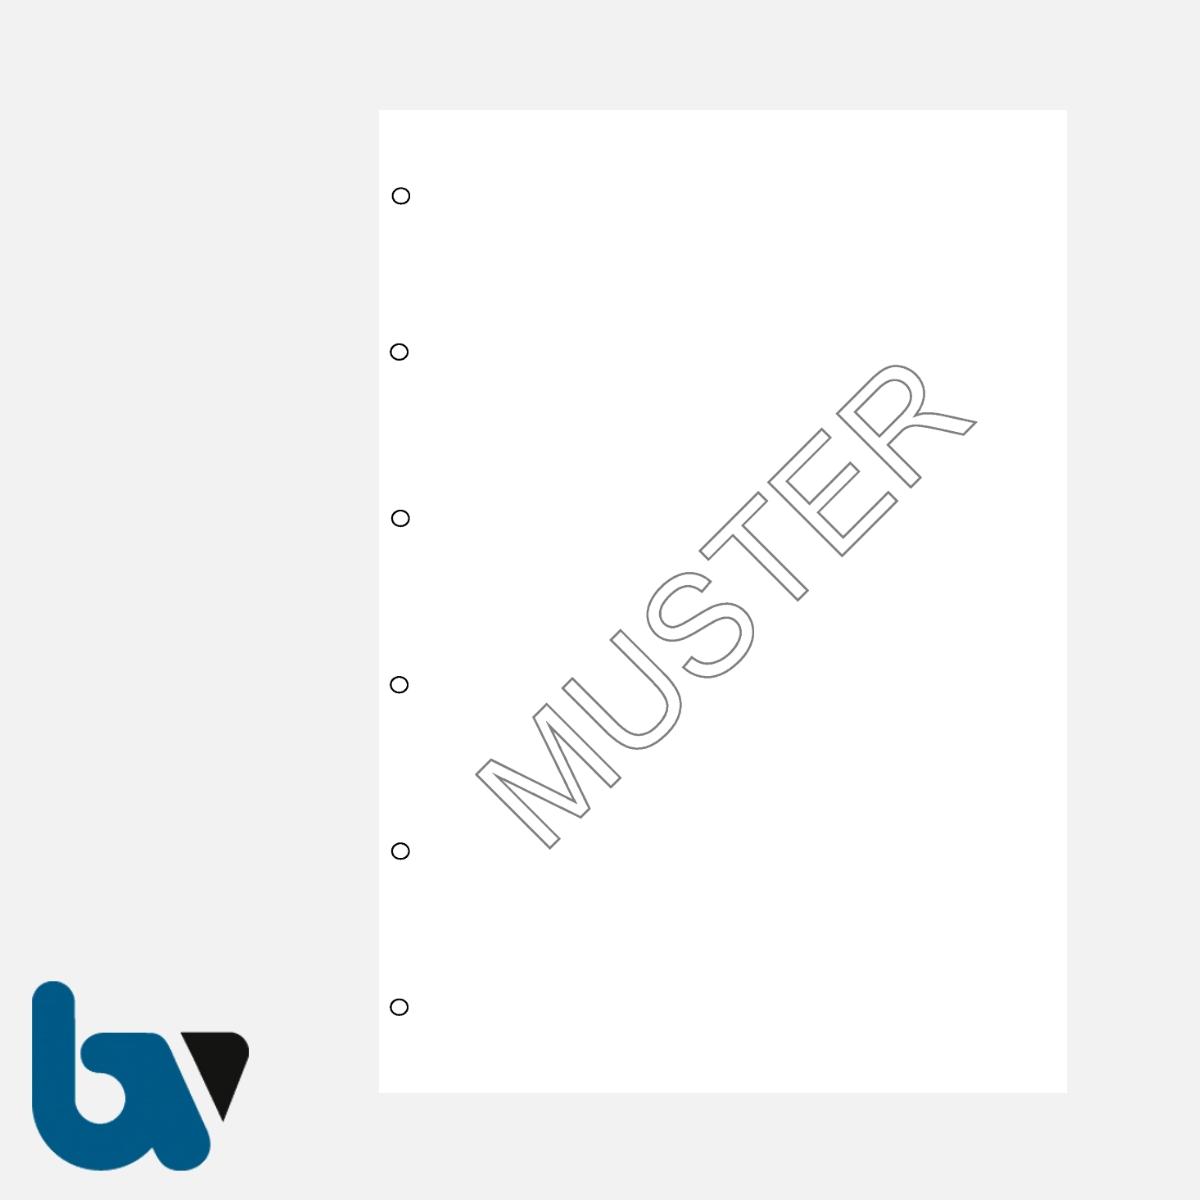 0/168-8g Urkundenpapier Standesamt Personenstand Urkunde Register Dokument 6-fach Lochung gelocht blanko 100gr Stammbuch Format 130 200 | Borgard Verlag GmbH